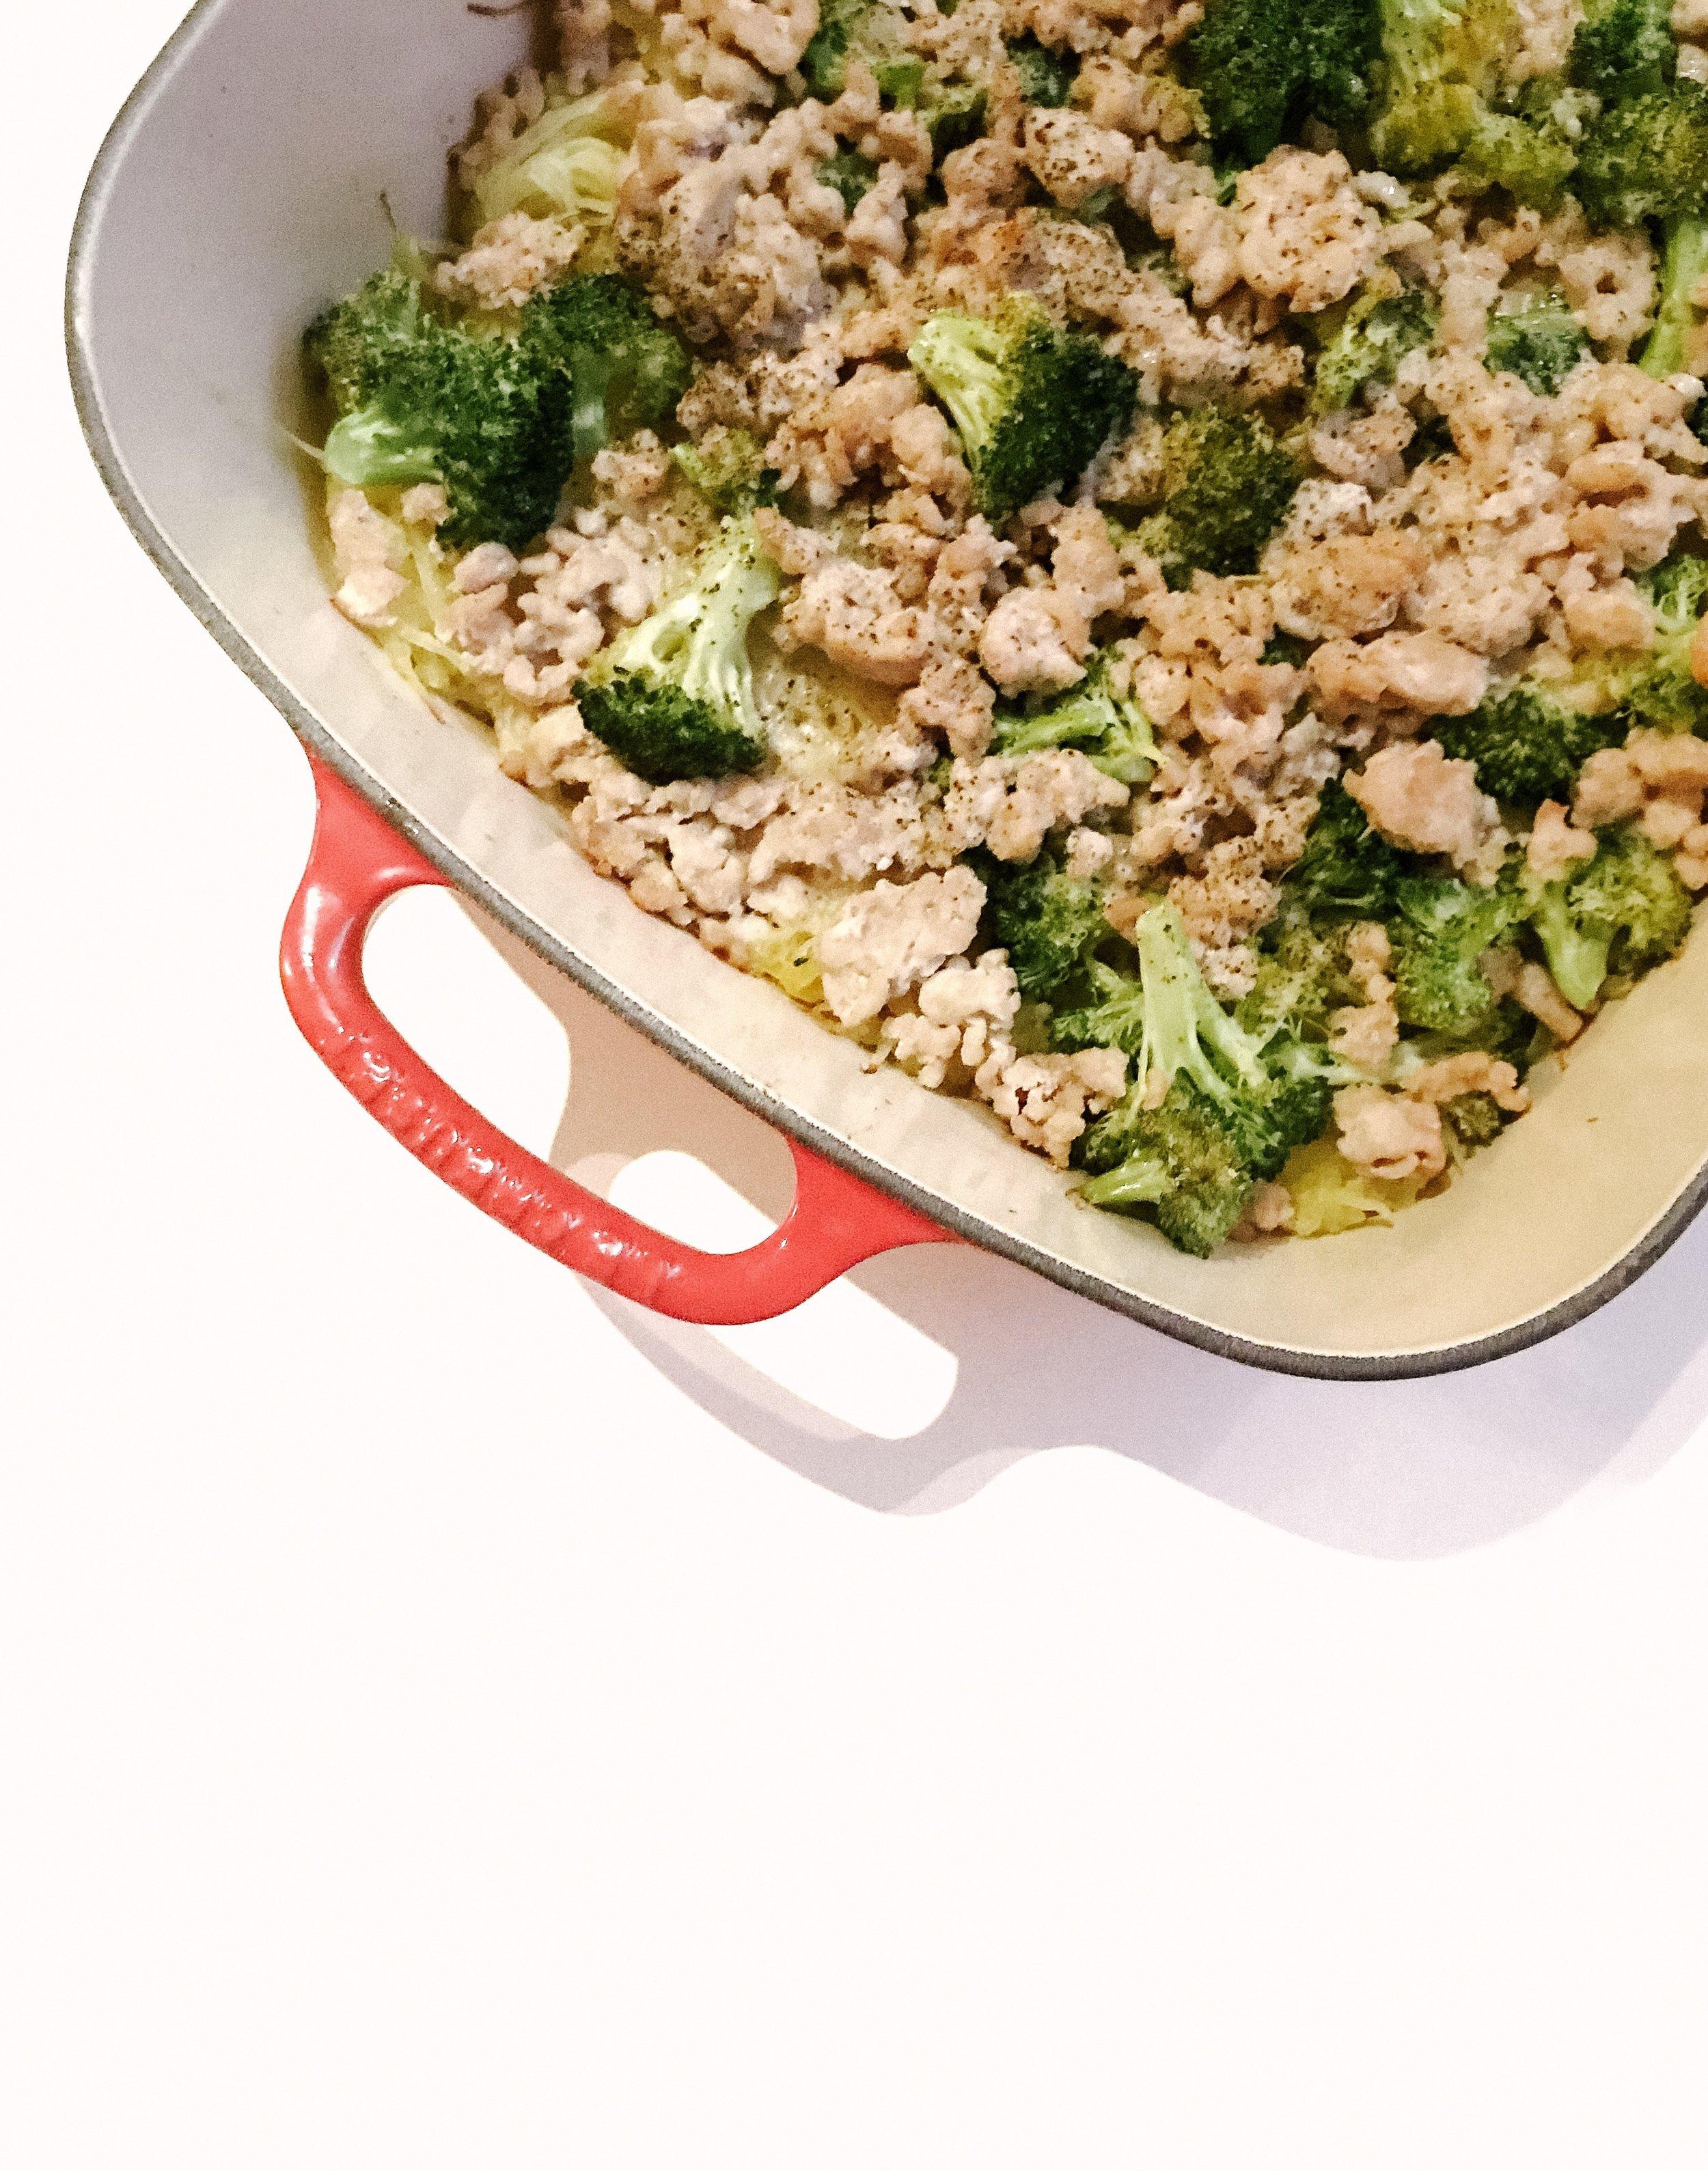 Creamy Garlic Spaghetti Squash Casserole (AIP, Paleo, GAPS, Gluten-Free, Dairy-Free, Dinner)